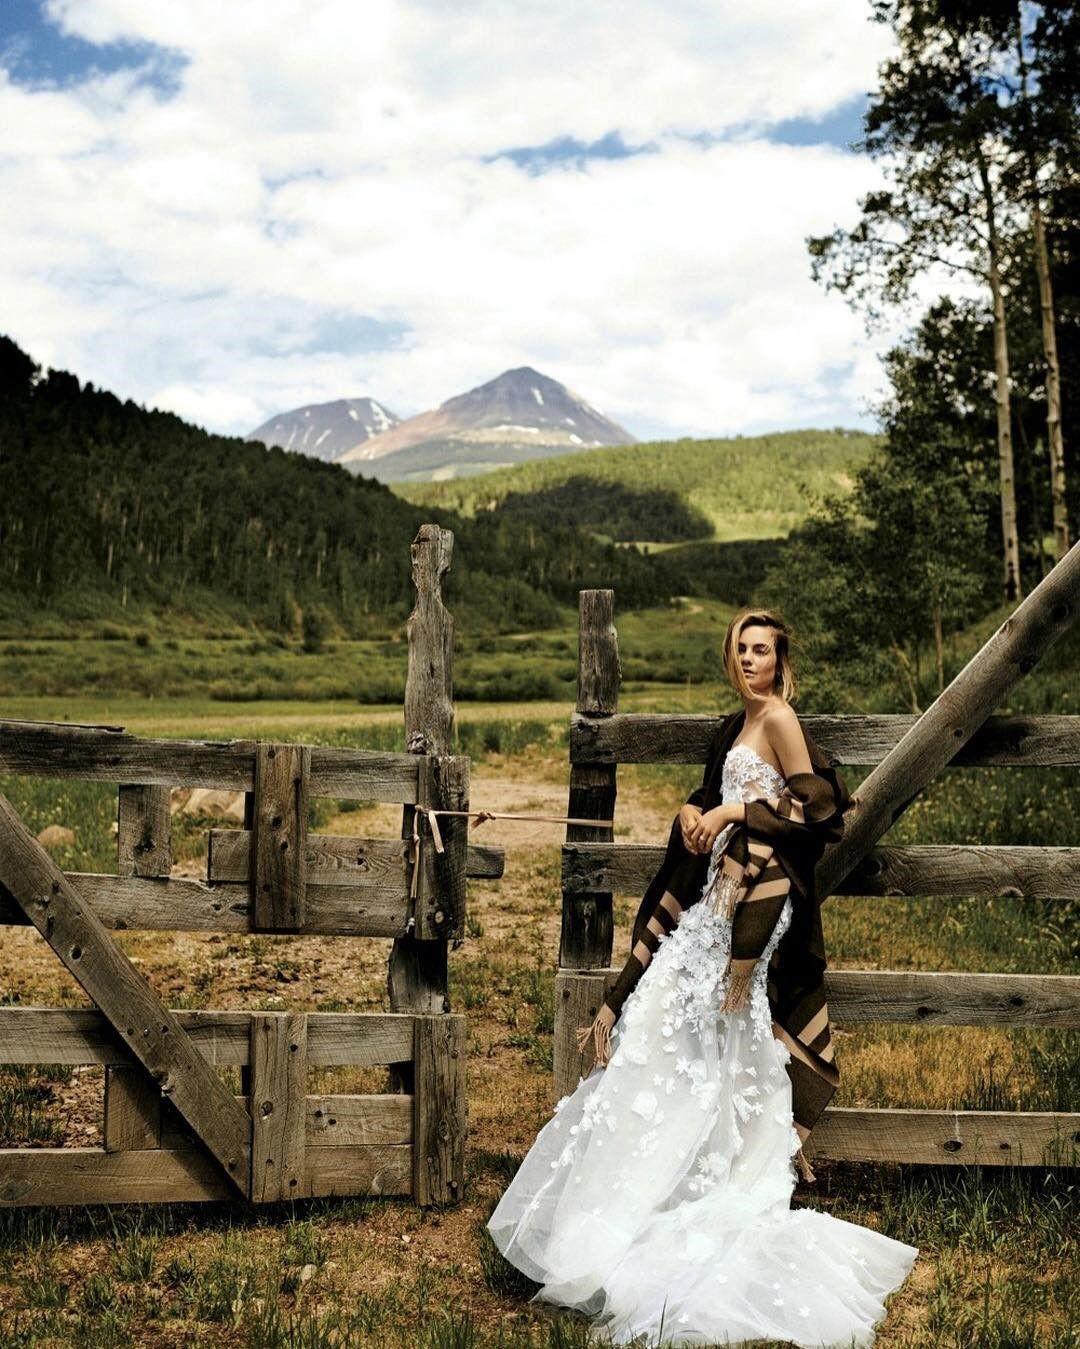 Midi Chiffon Wedding Dresses   Brides magazine, Wedding dresses ...